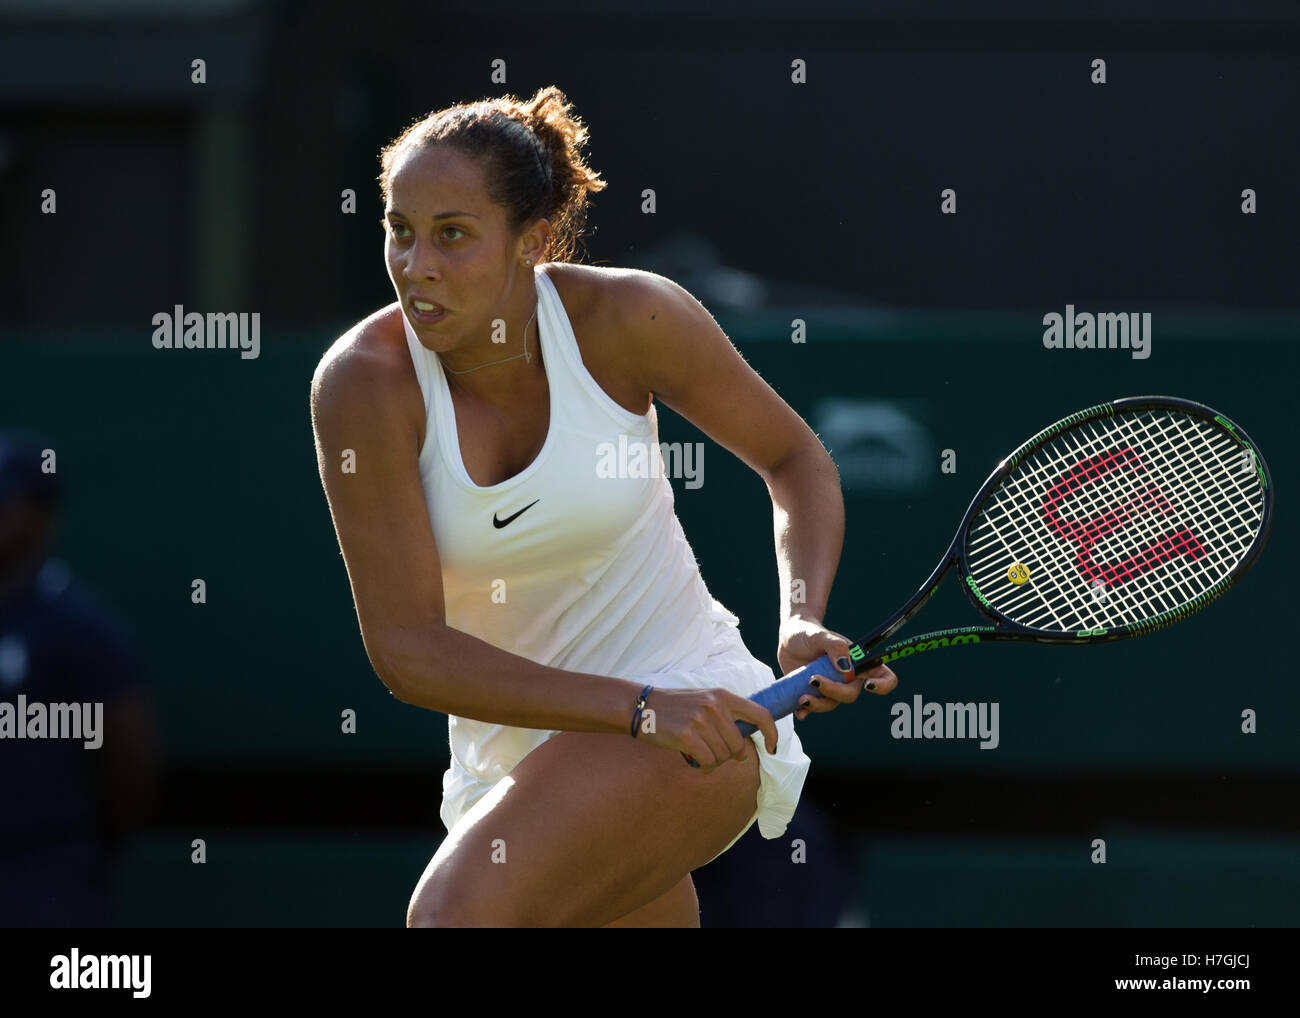 Madison Keys (USA) in action at Wimbledon 2016 - Stock Image